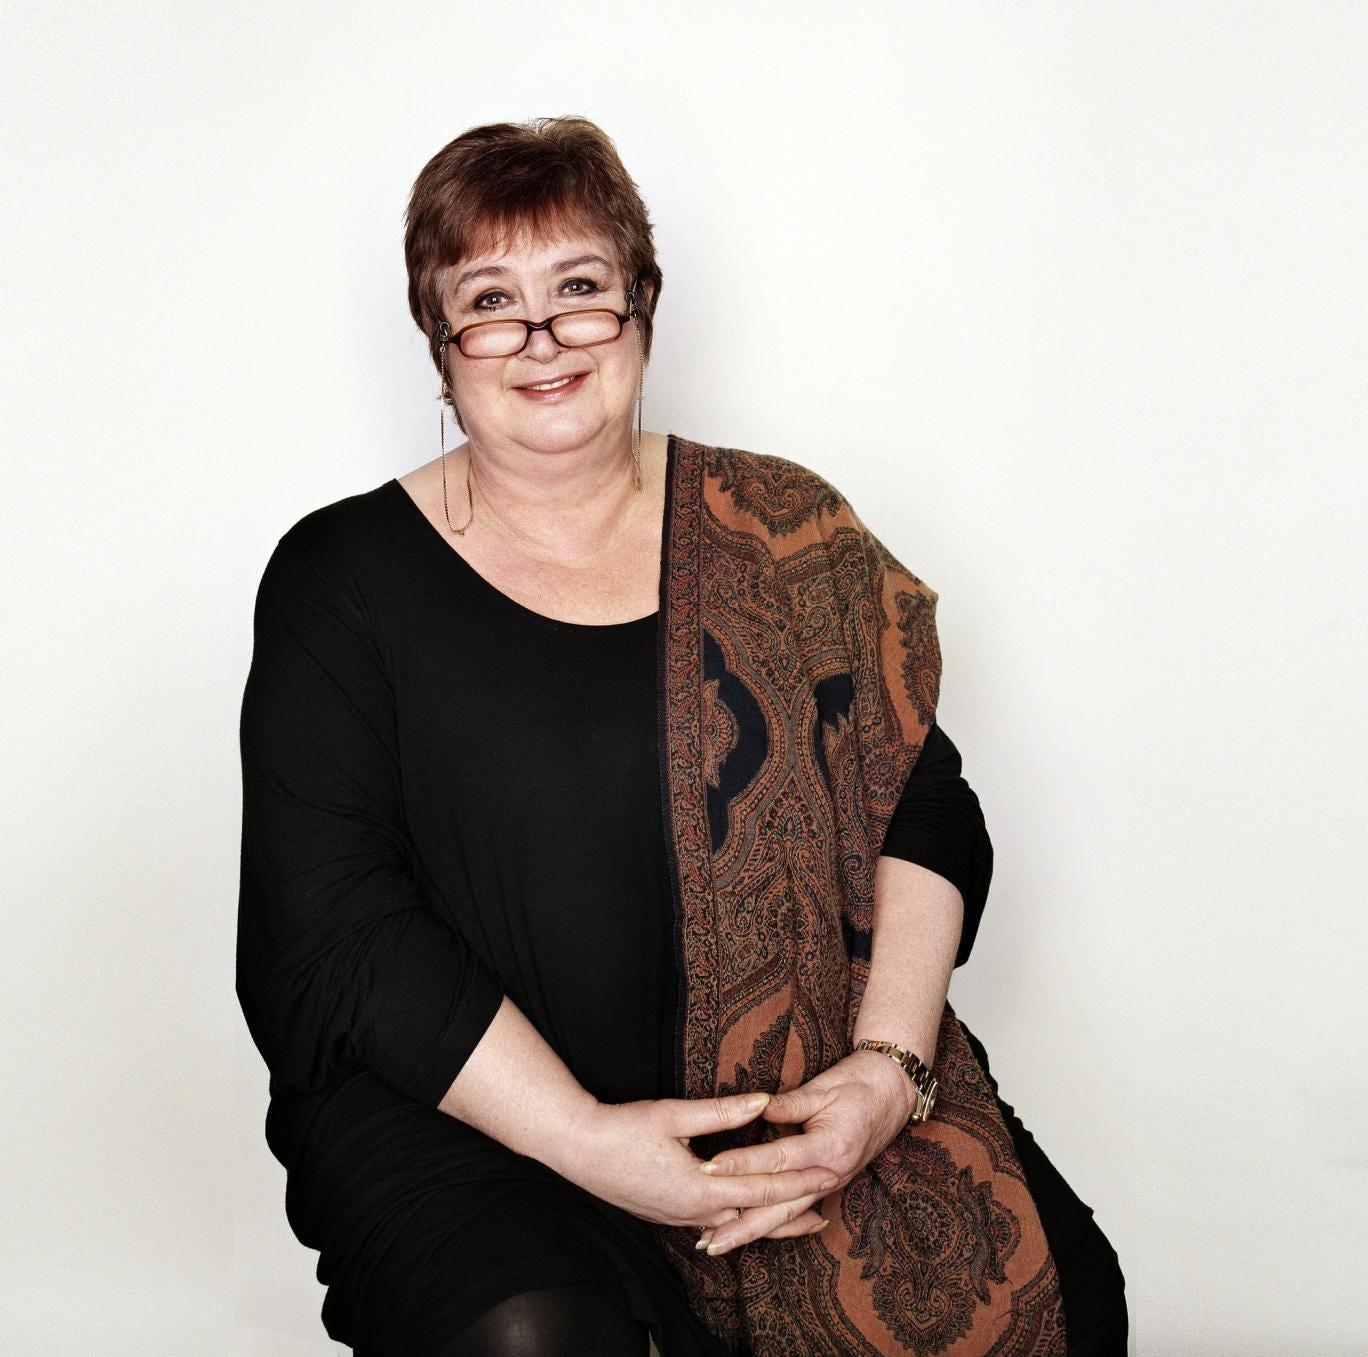 Presenter of Woman's Hour, Jenni Murray